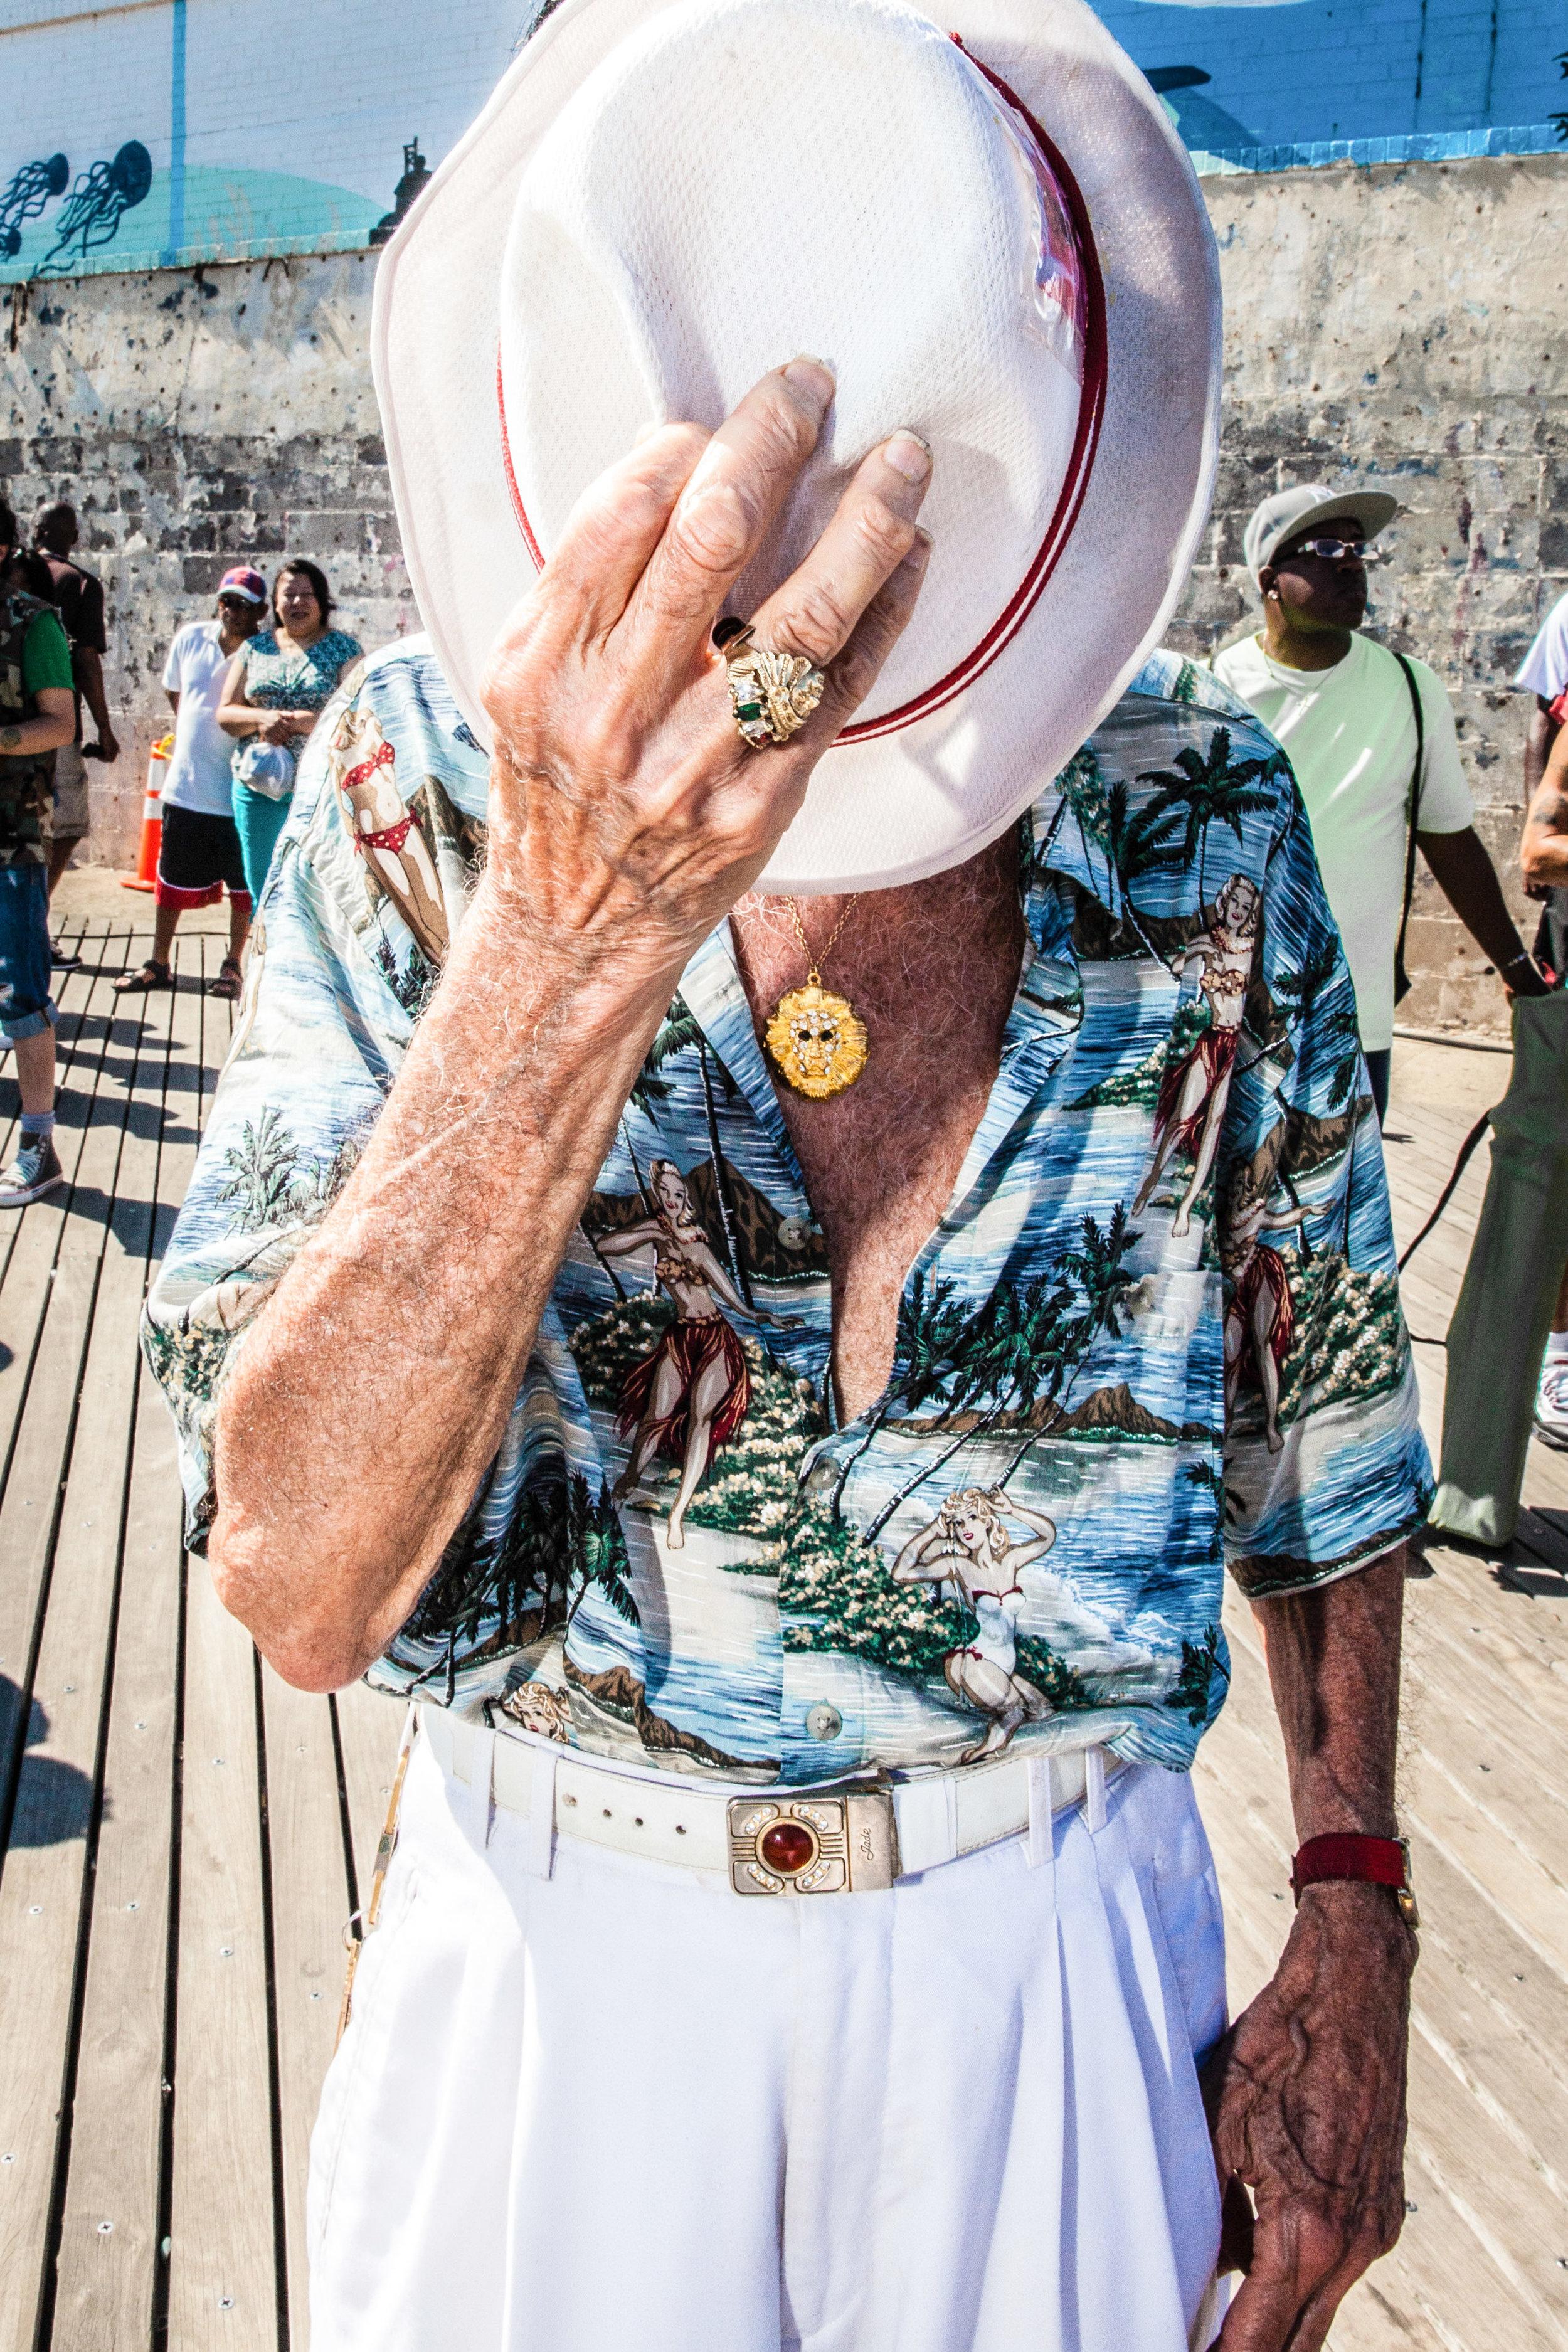 Lot 577 Beach Body Bingo - Disco Is Dead - Photograph